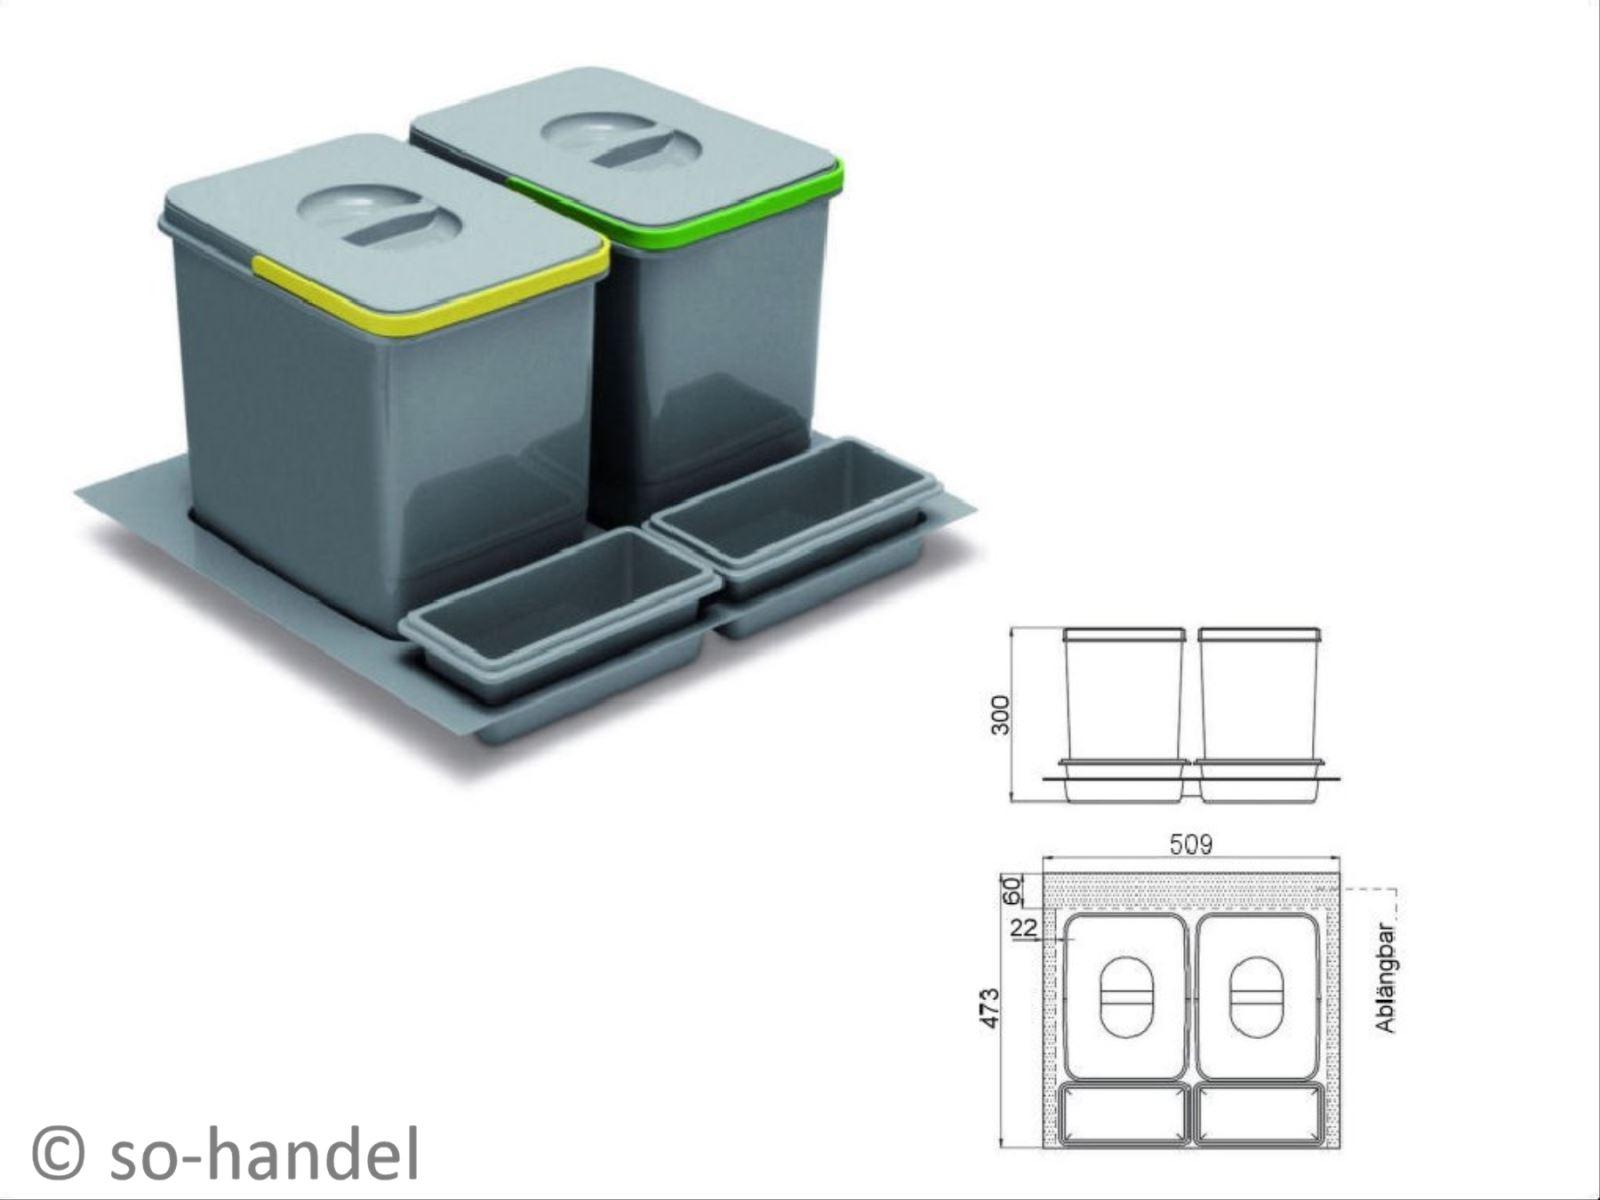 multino abfalltrennsystem abfallsammler m lleimer abfalleimer m lltrenner eimer ebay. Black Bedroom Furniture Sets. Home Design Ideas